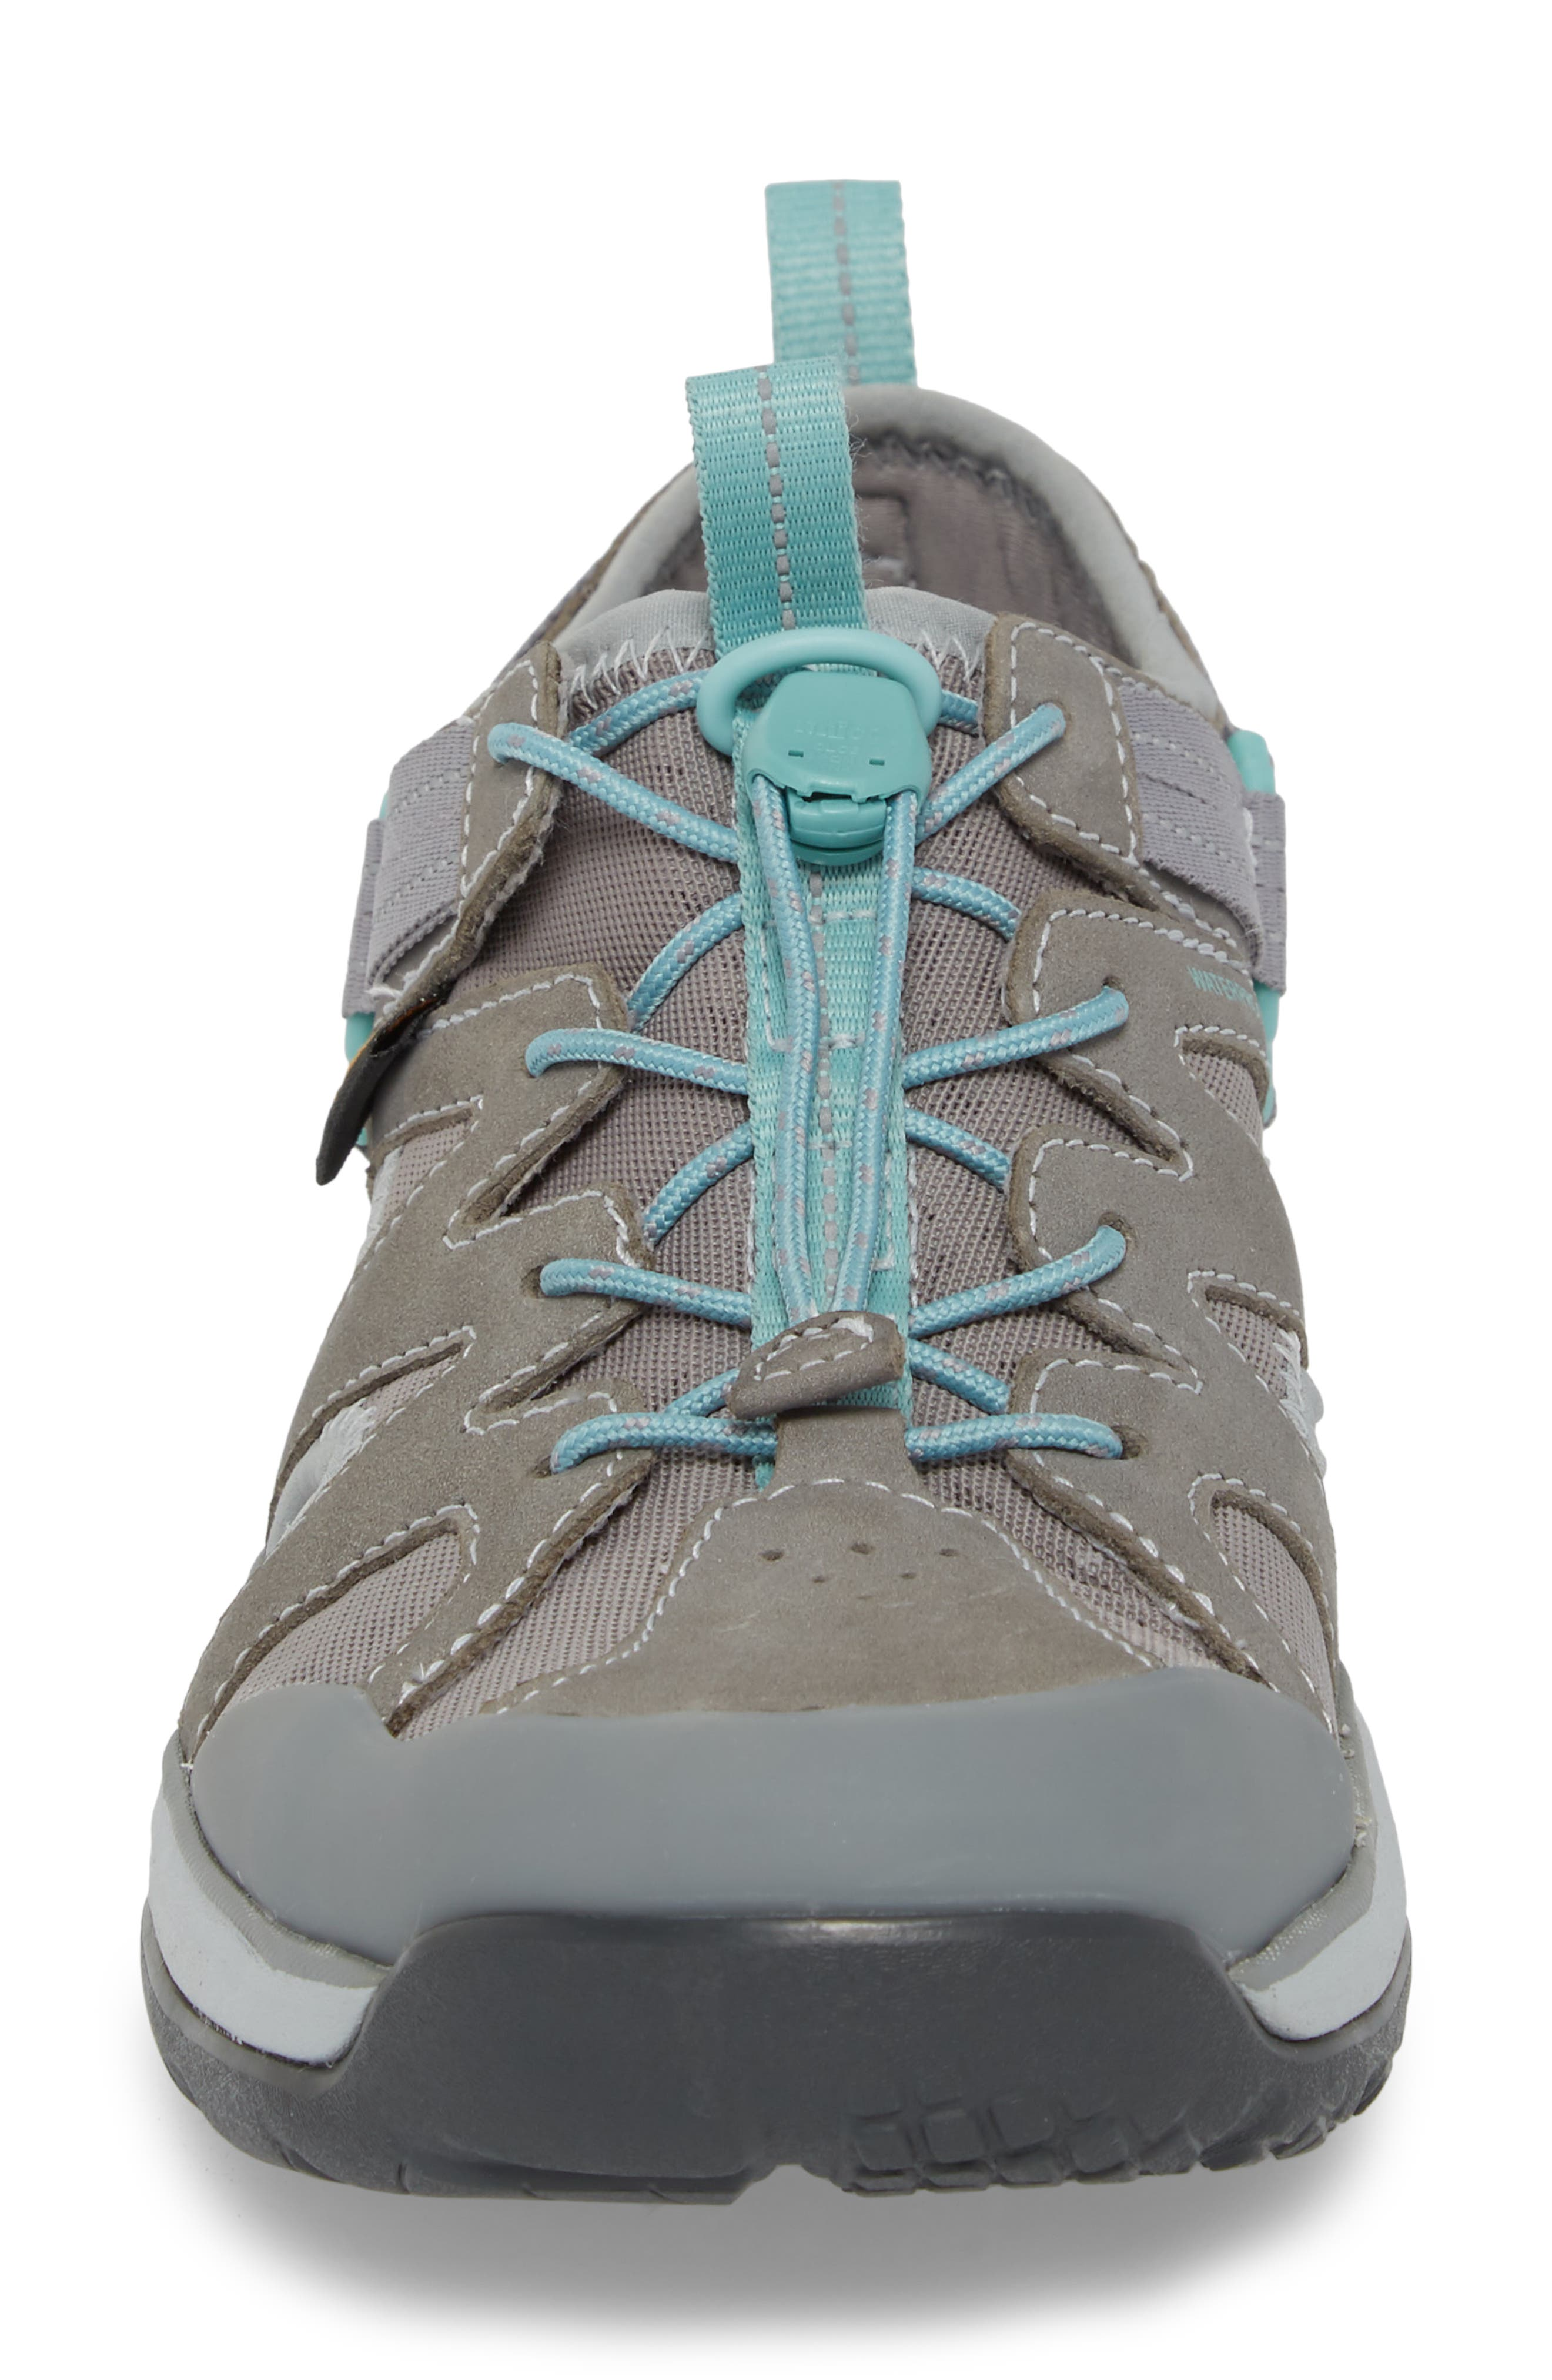 Terra Float Active Sandal,                             Alternate thumbnail 4, color,                             Wild Dove